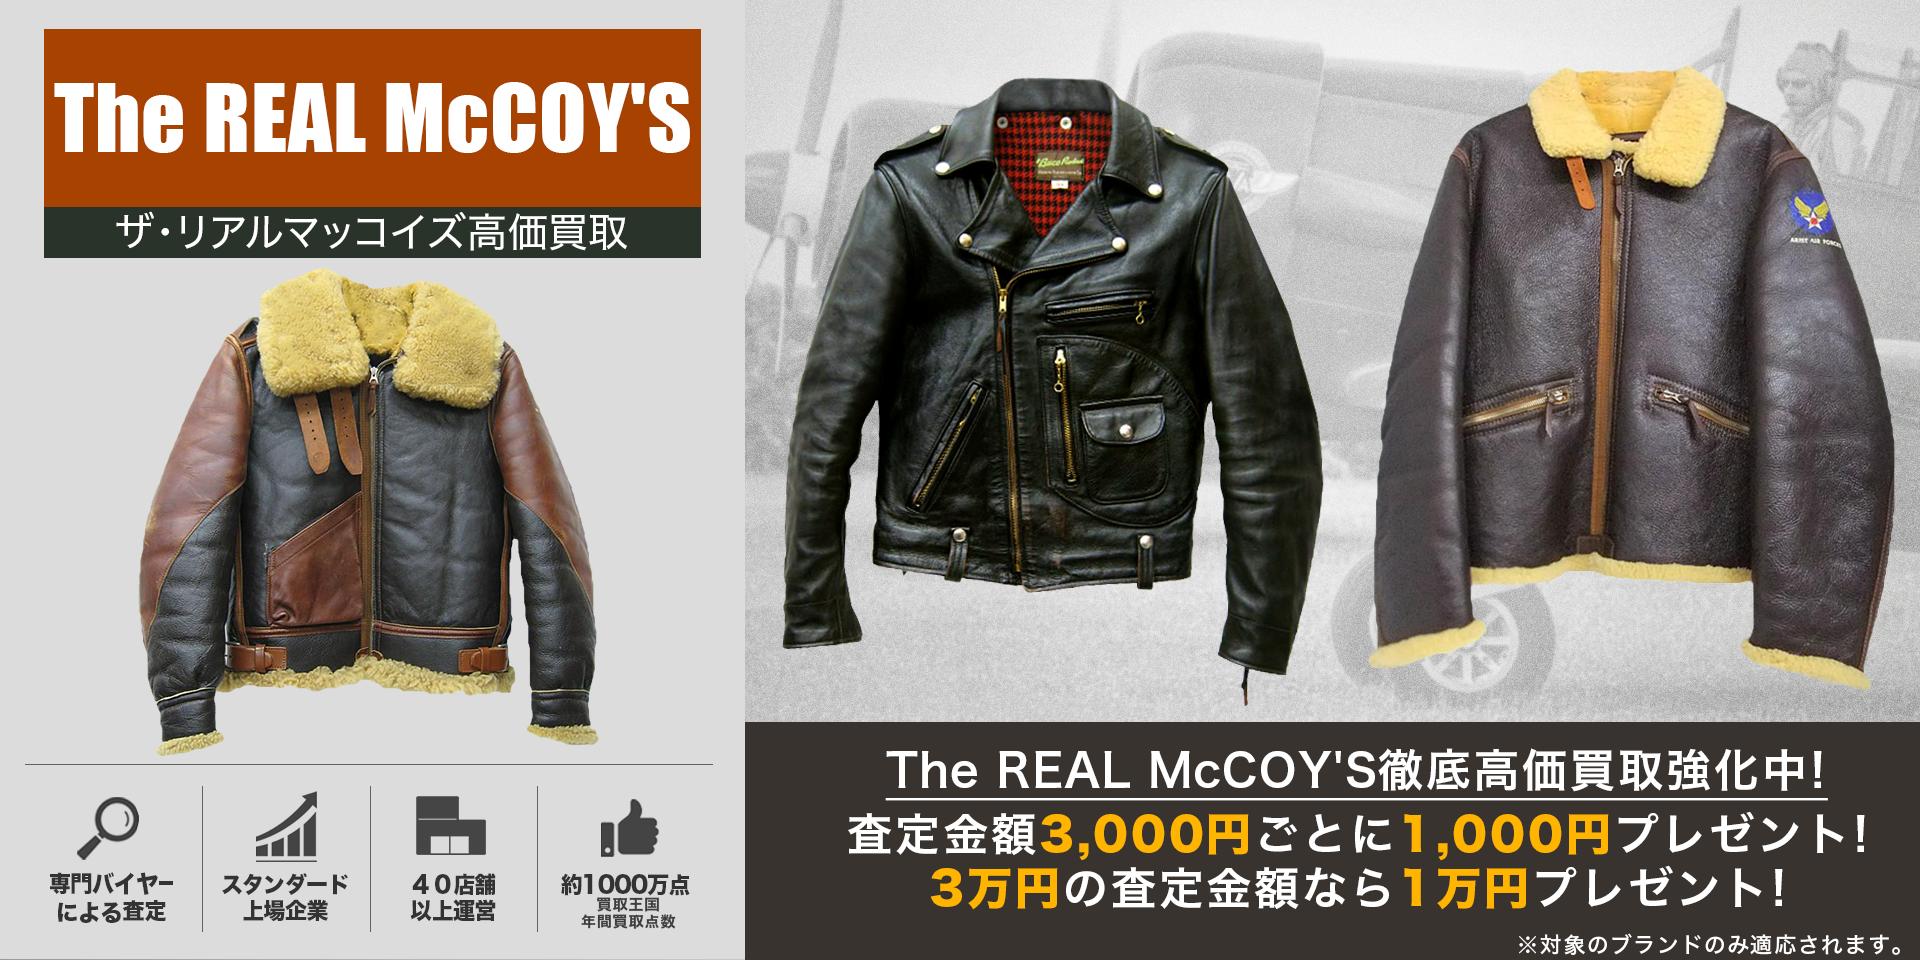 The REAL McCOY'Sのキービジュアル